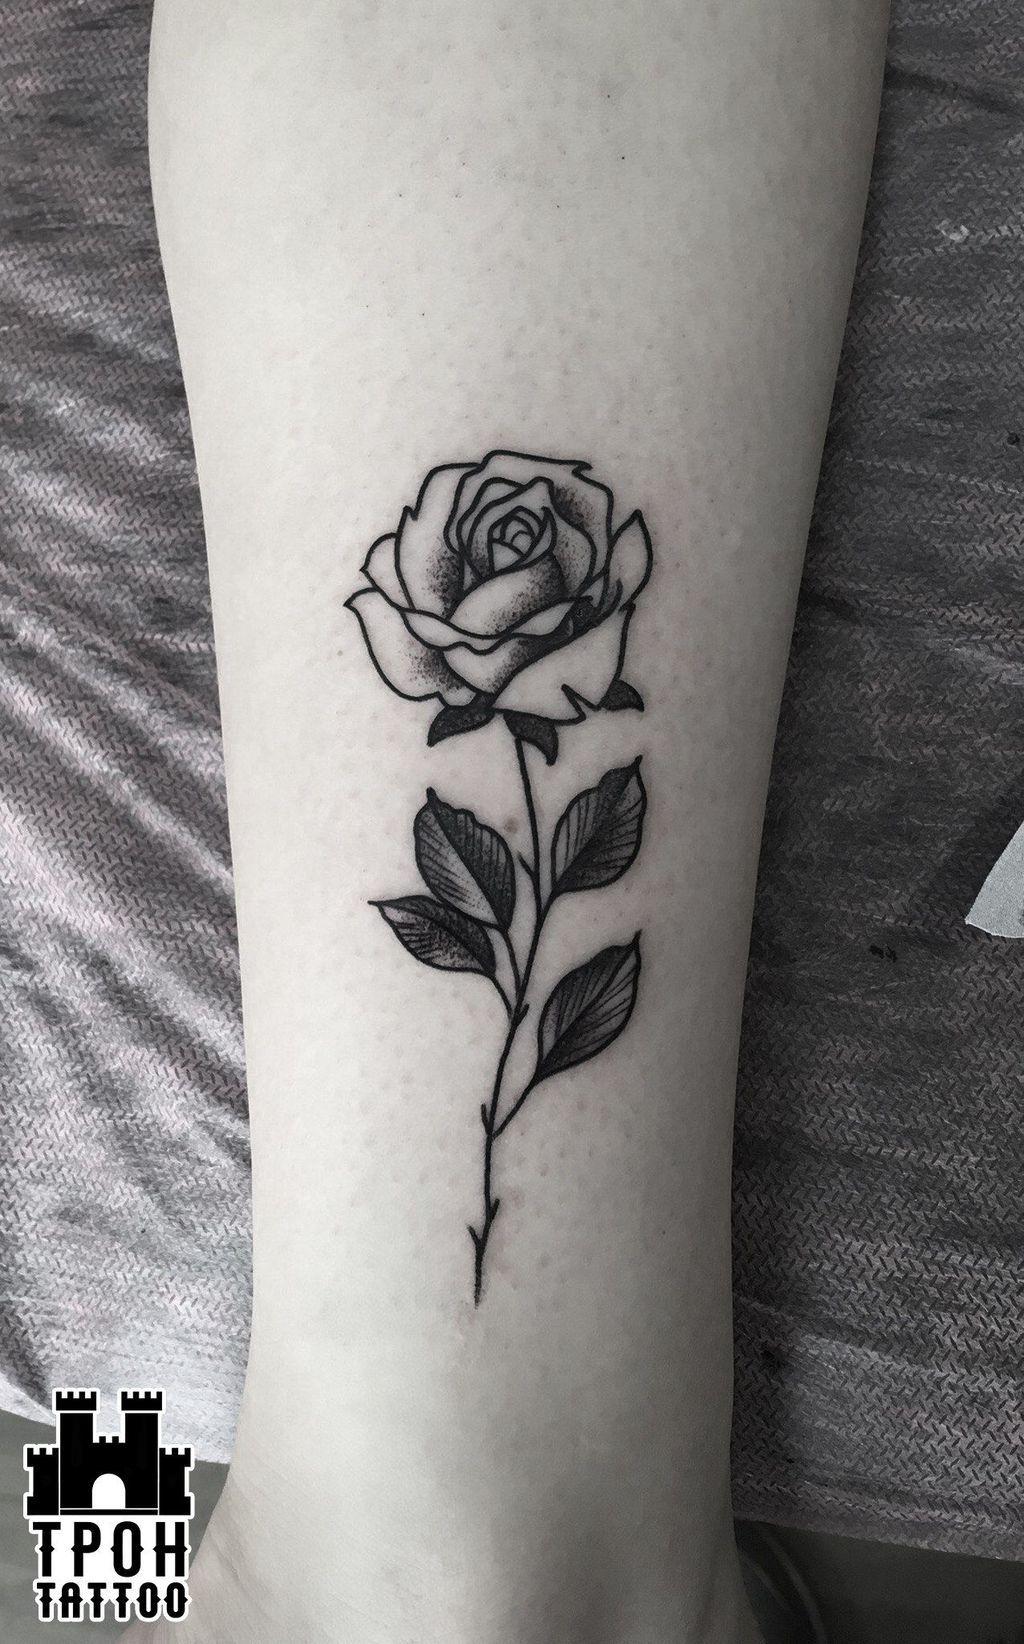 20 Flawless Forearm Tattoos Designs Ideas For Men To Try Forearm Tattoos Forearm Tattoo Men Rose Tattoos For Men